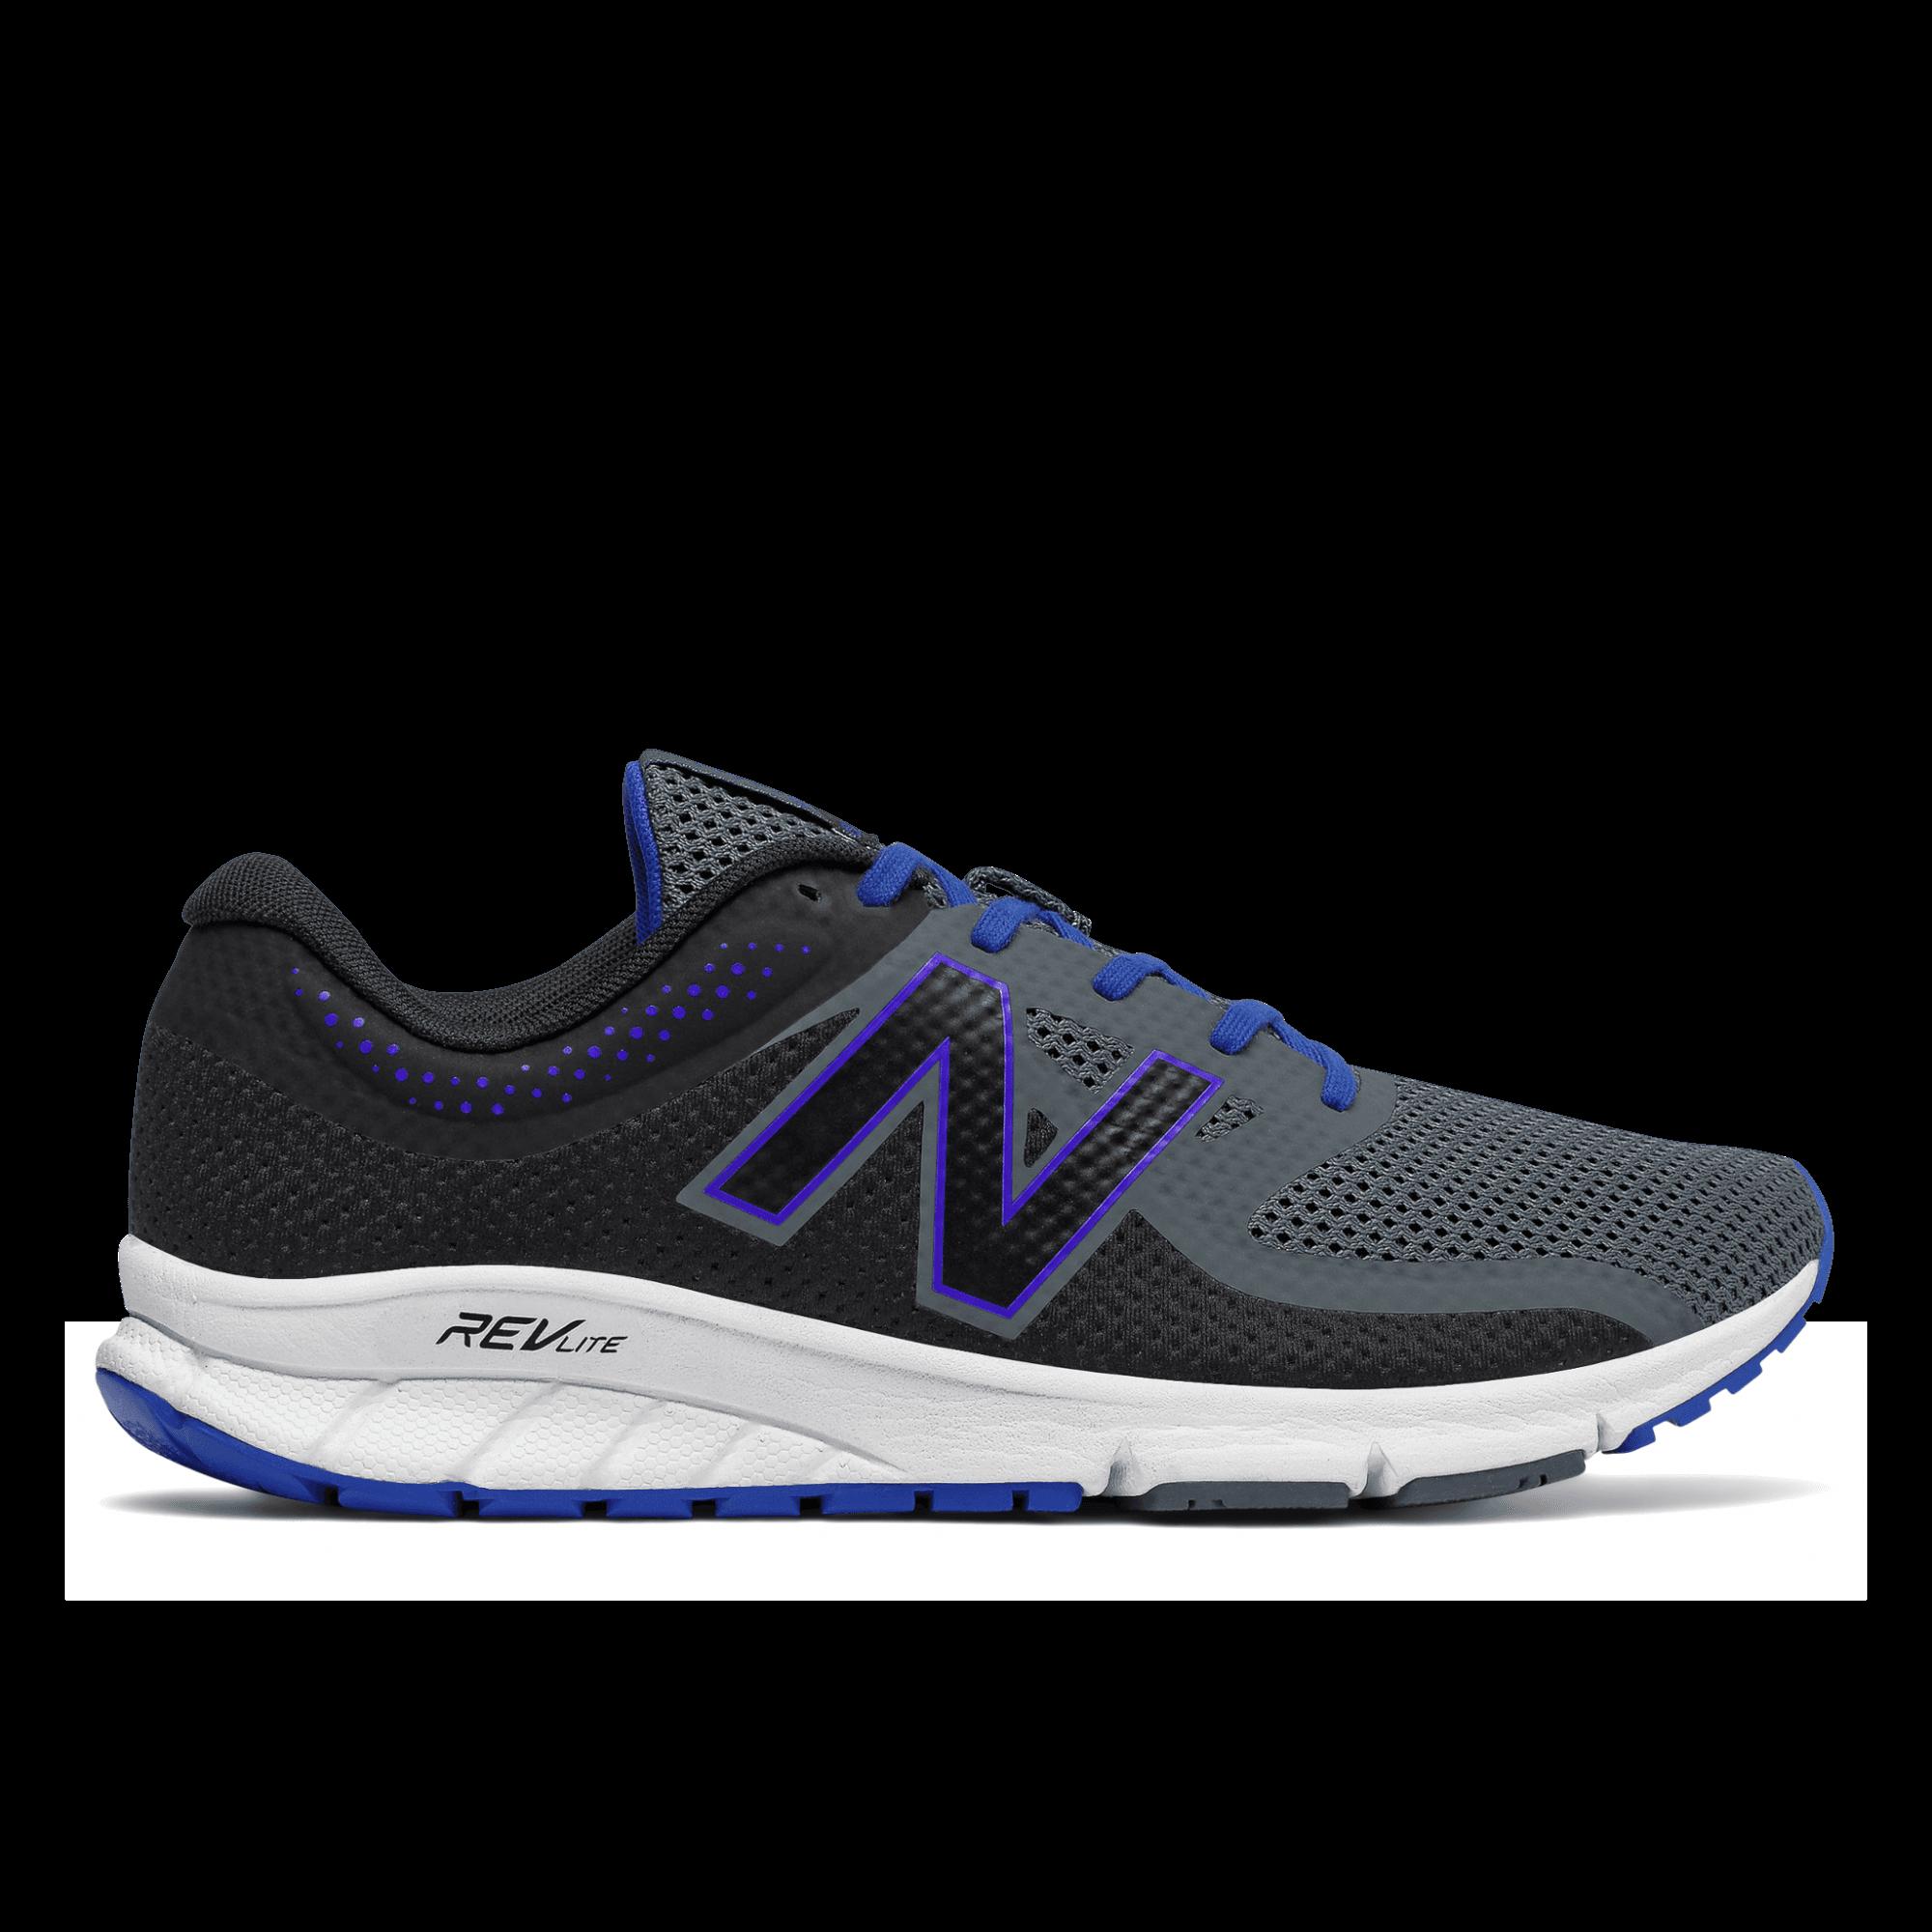 New Balance Men's Quicka RN Running Shoes | BMC Sports